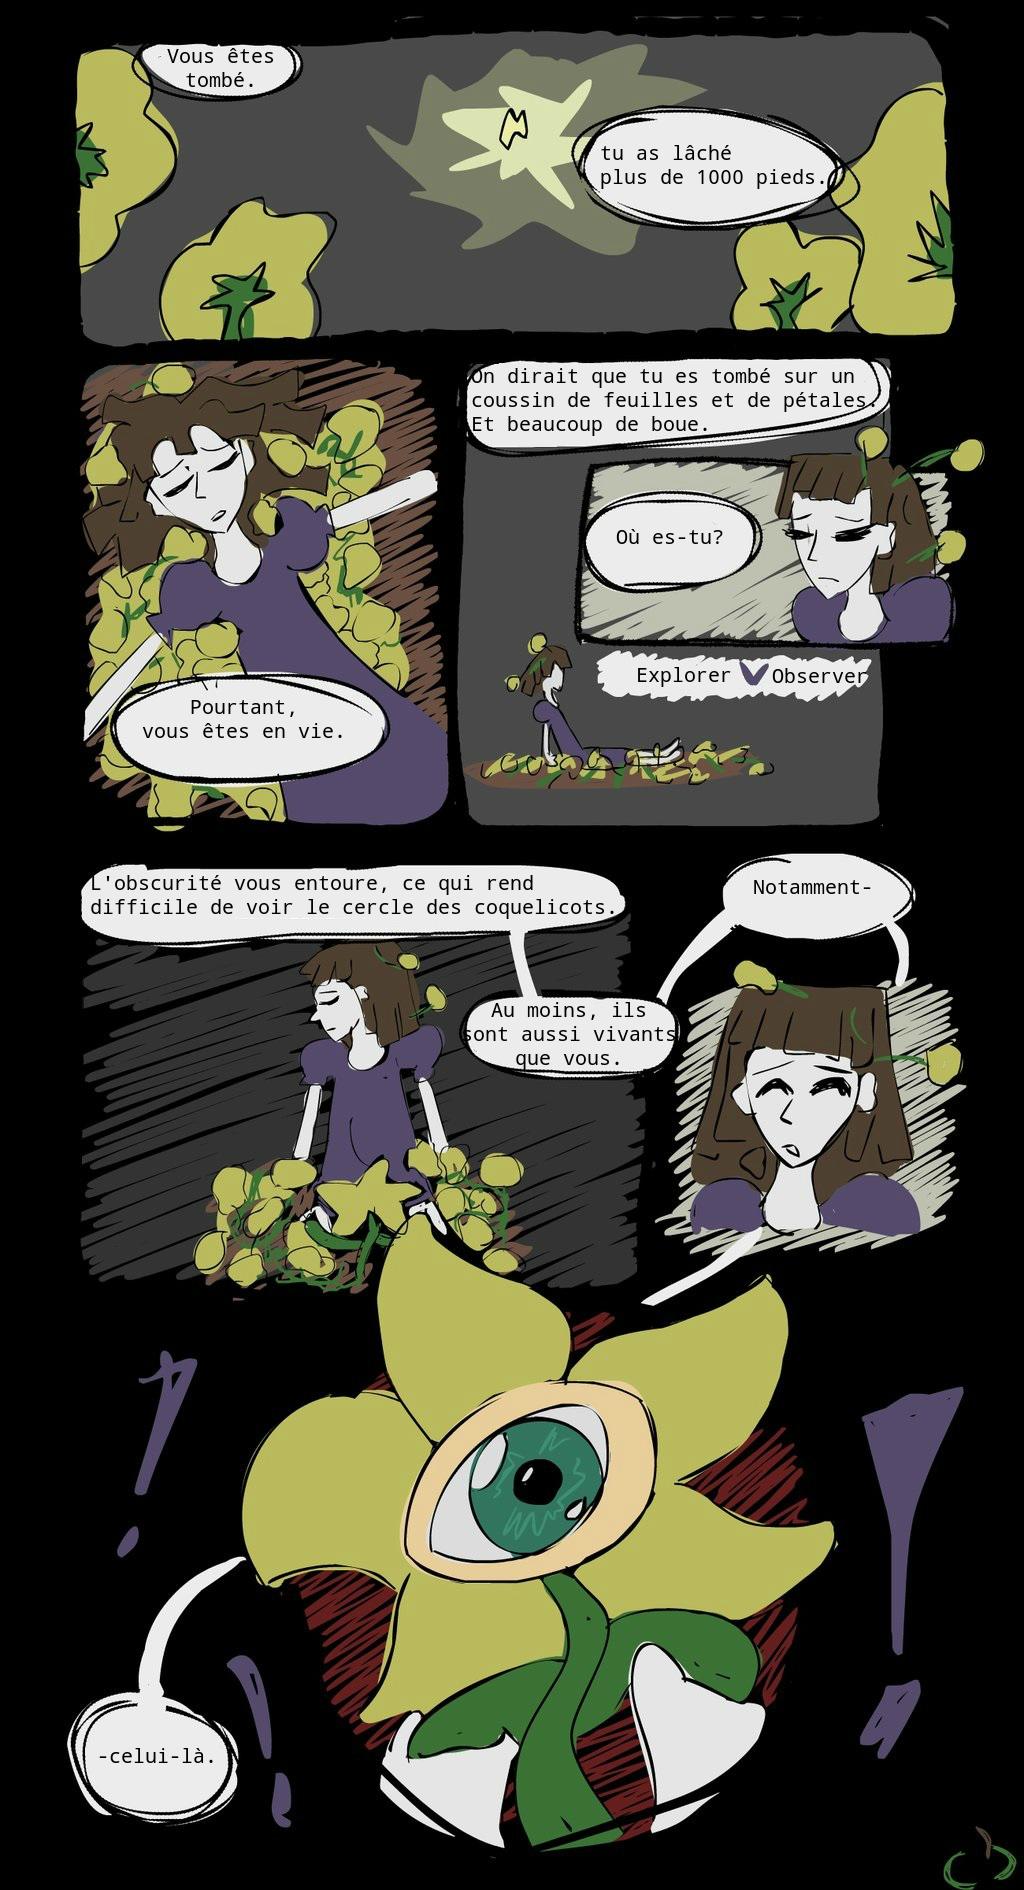 Horrortale en francais (in french) 1: Tombe by MSmelodys0ul